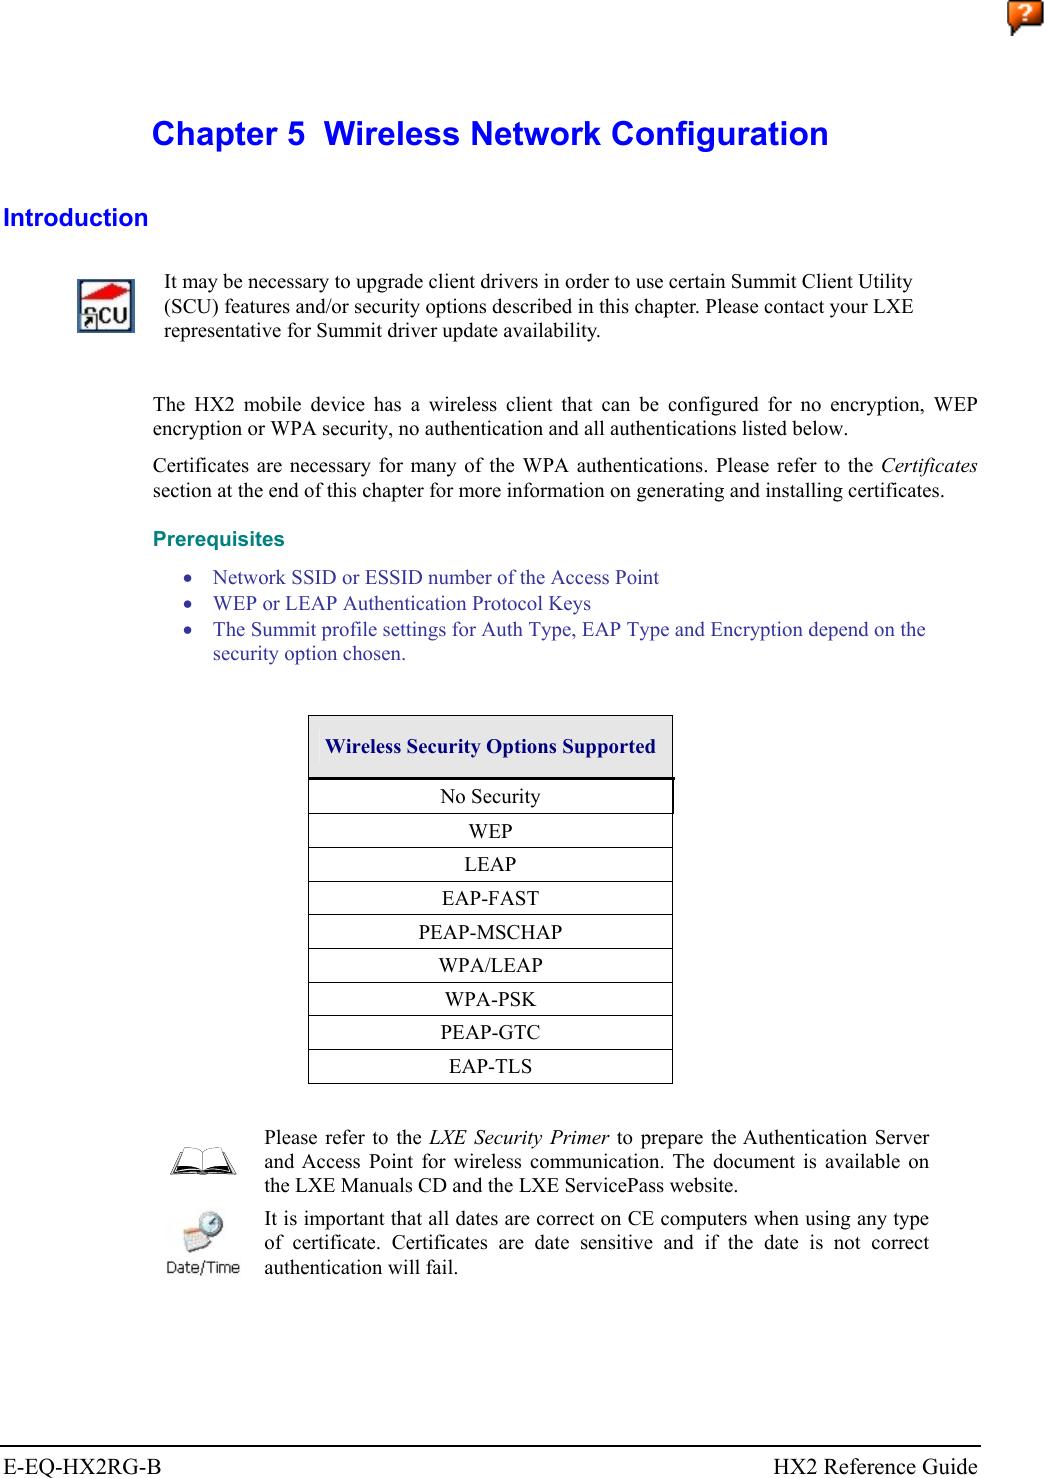 Lxe Hx2 E Eq Hx2Rg B Users Manual Reference Guide